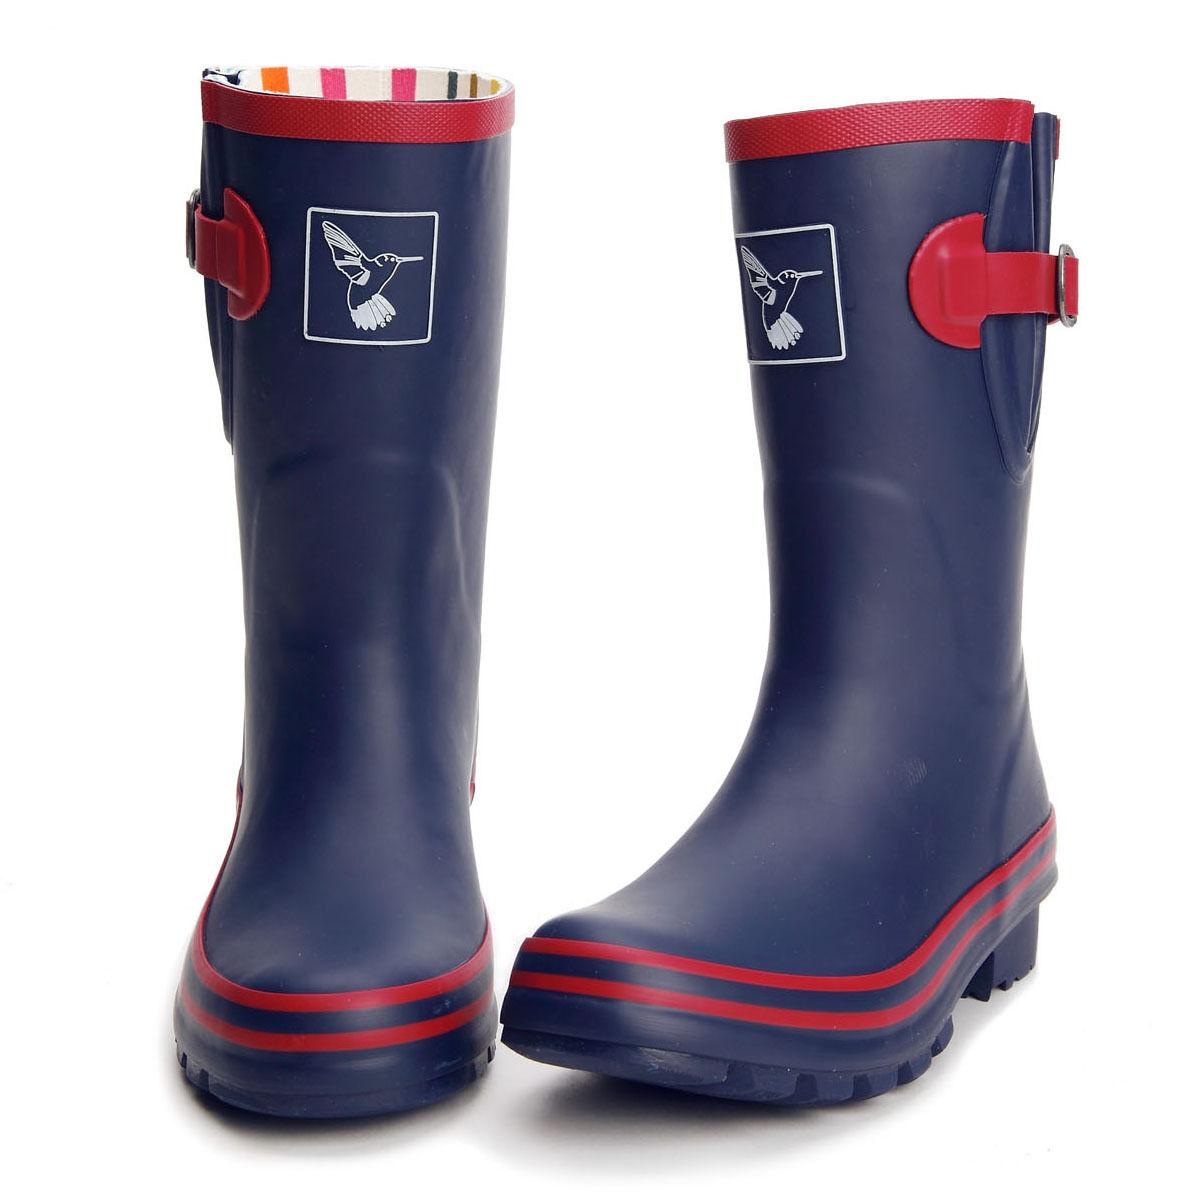 Evercreatures High Quality Women's Rain Boot Wellies Waterproof Boots UK Brand